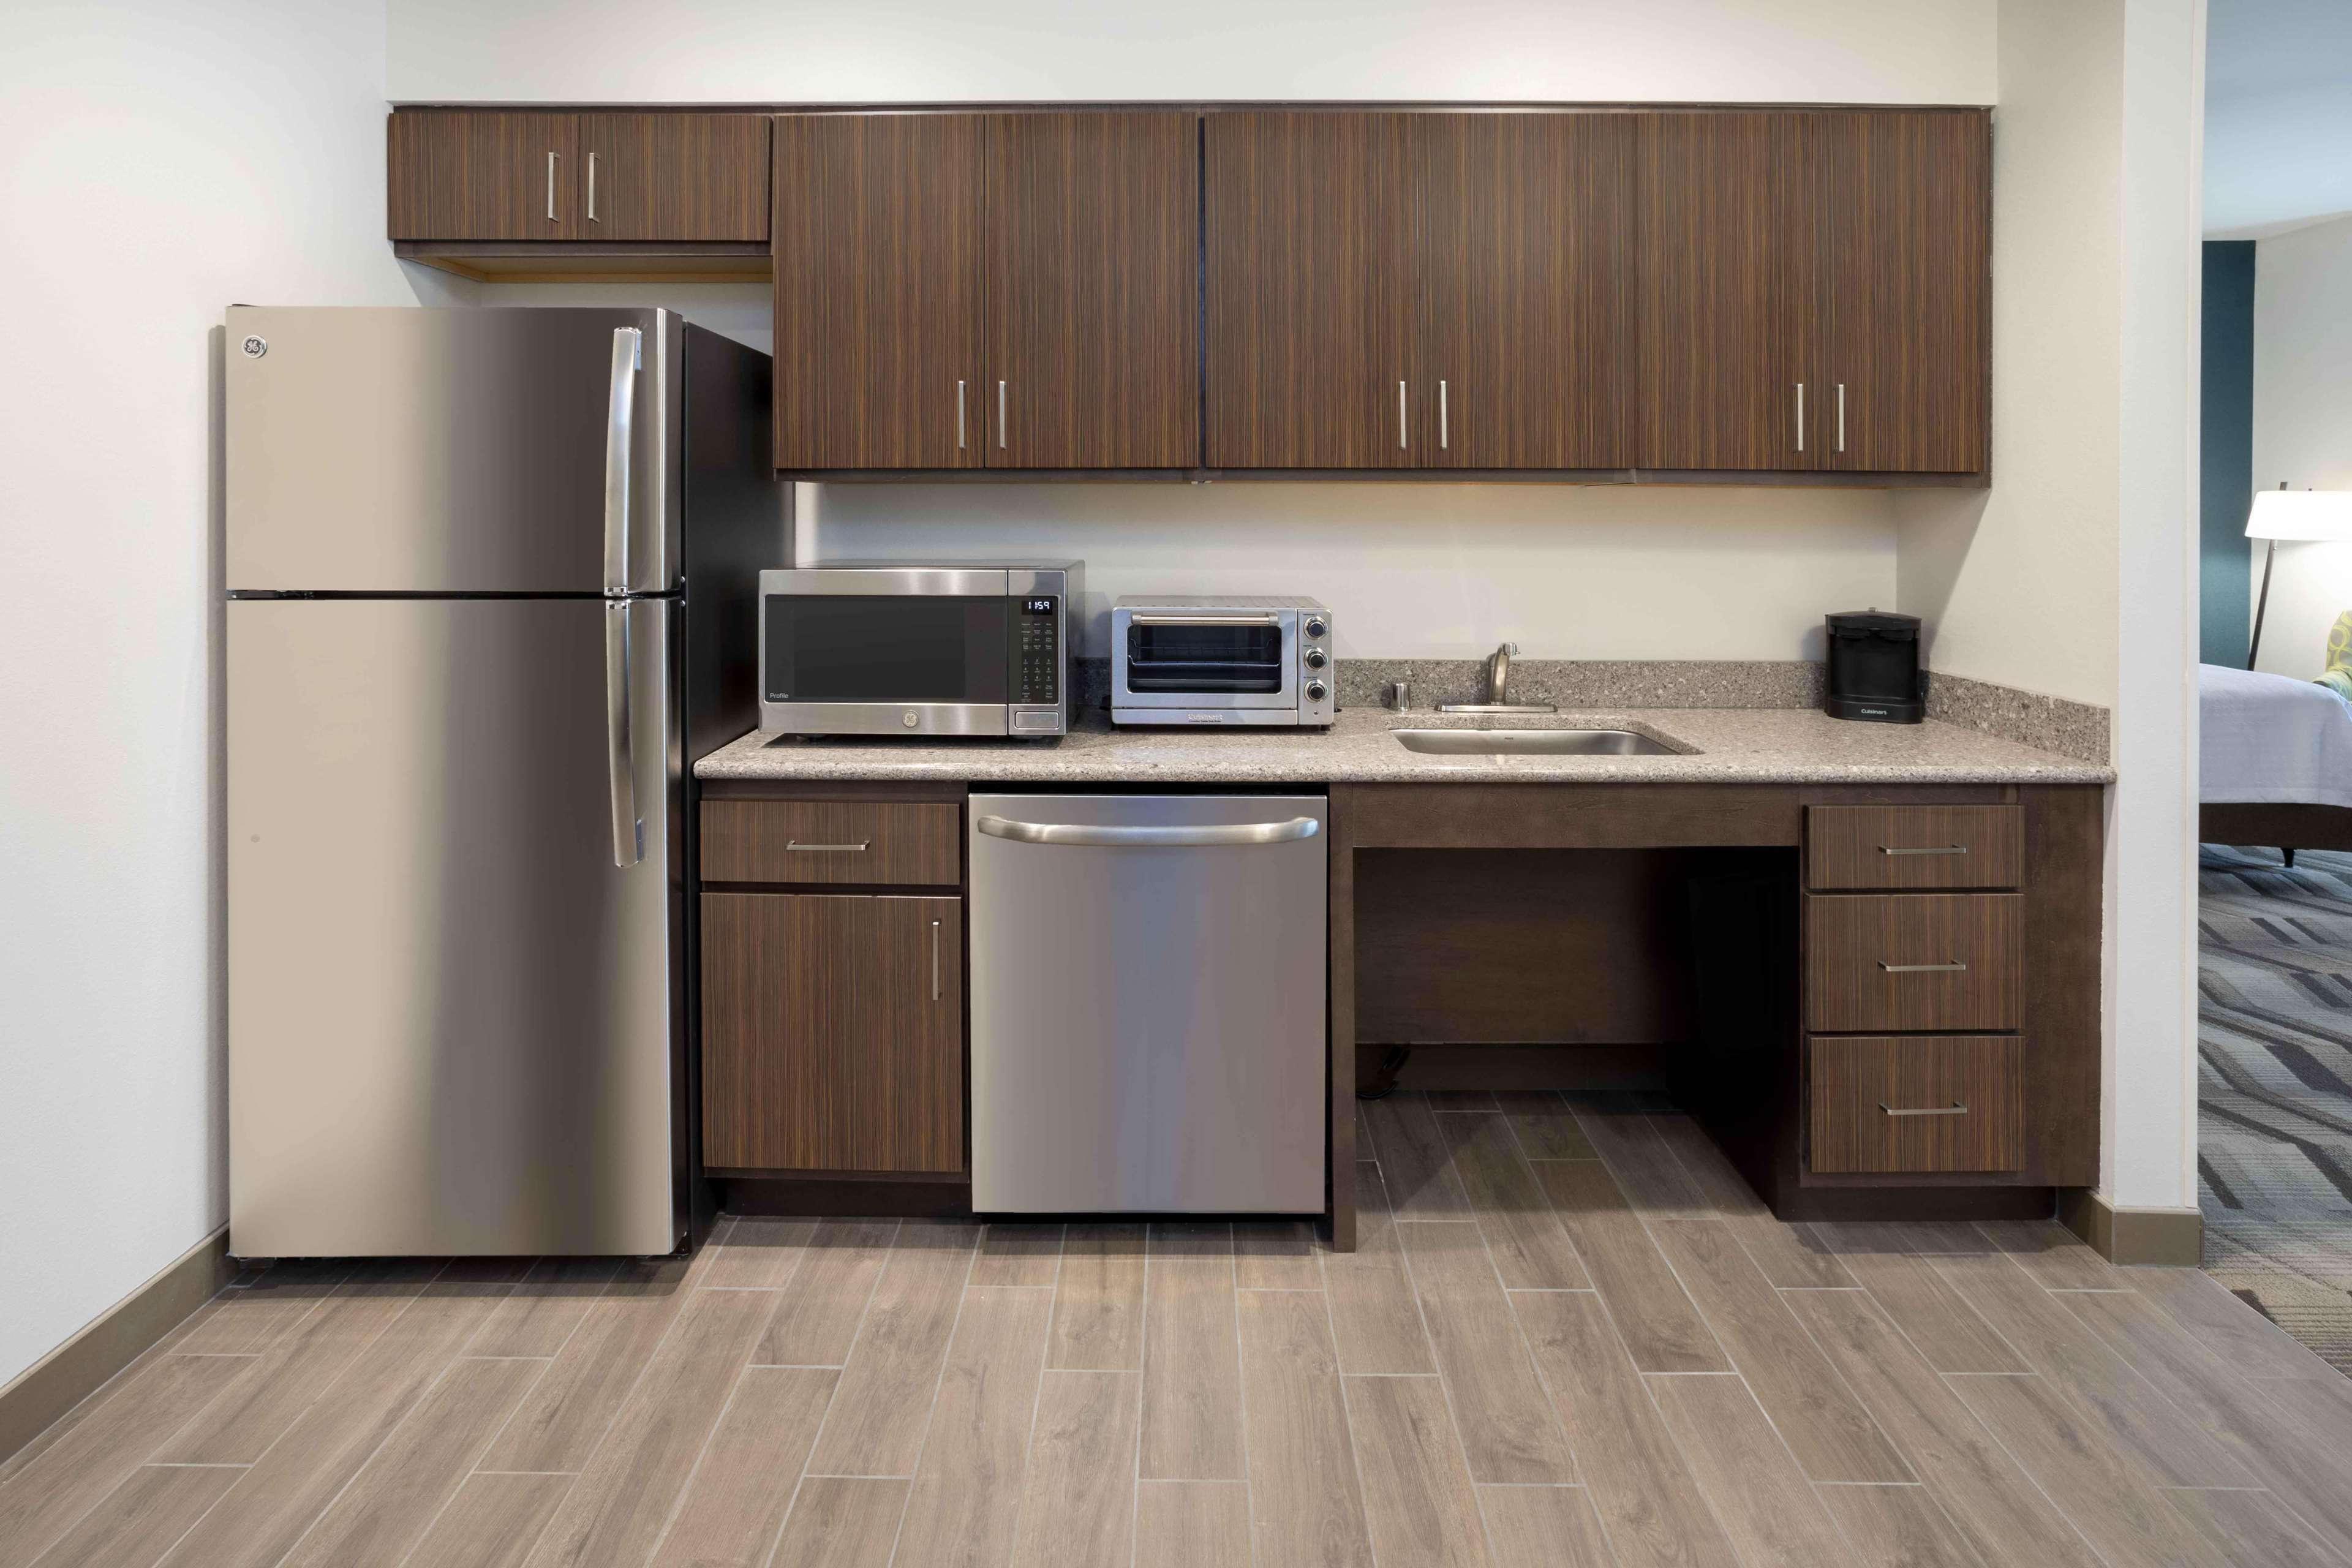 Homewood Suites by Hilton Edina Minneapolis image 19